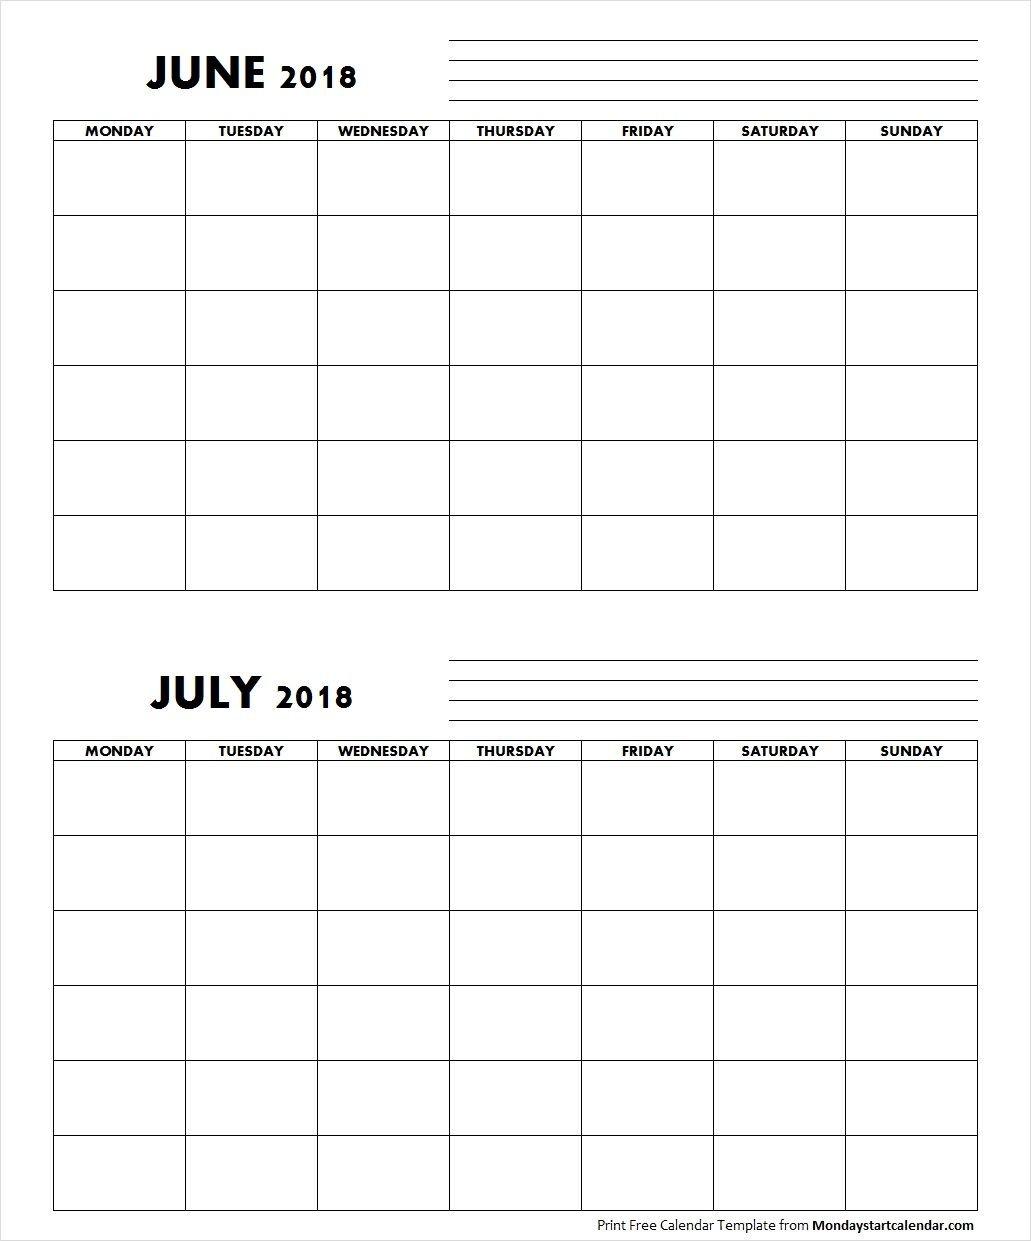 Blank June July 2018 Calendar Monday Start | Free Blank Sunday Through Saturday Calendar